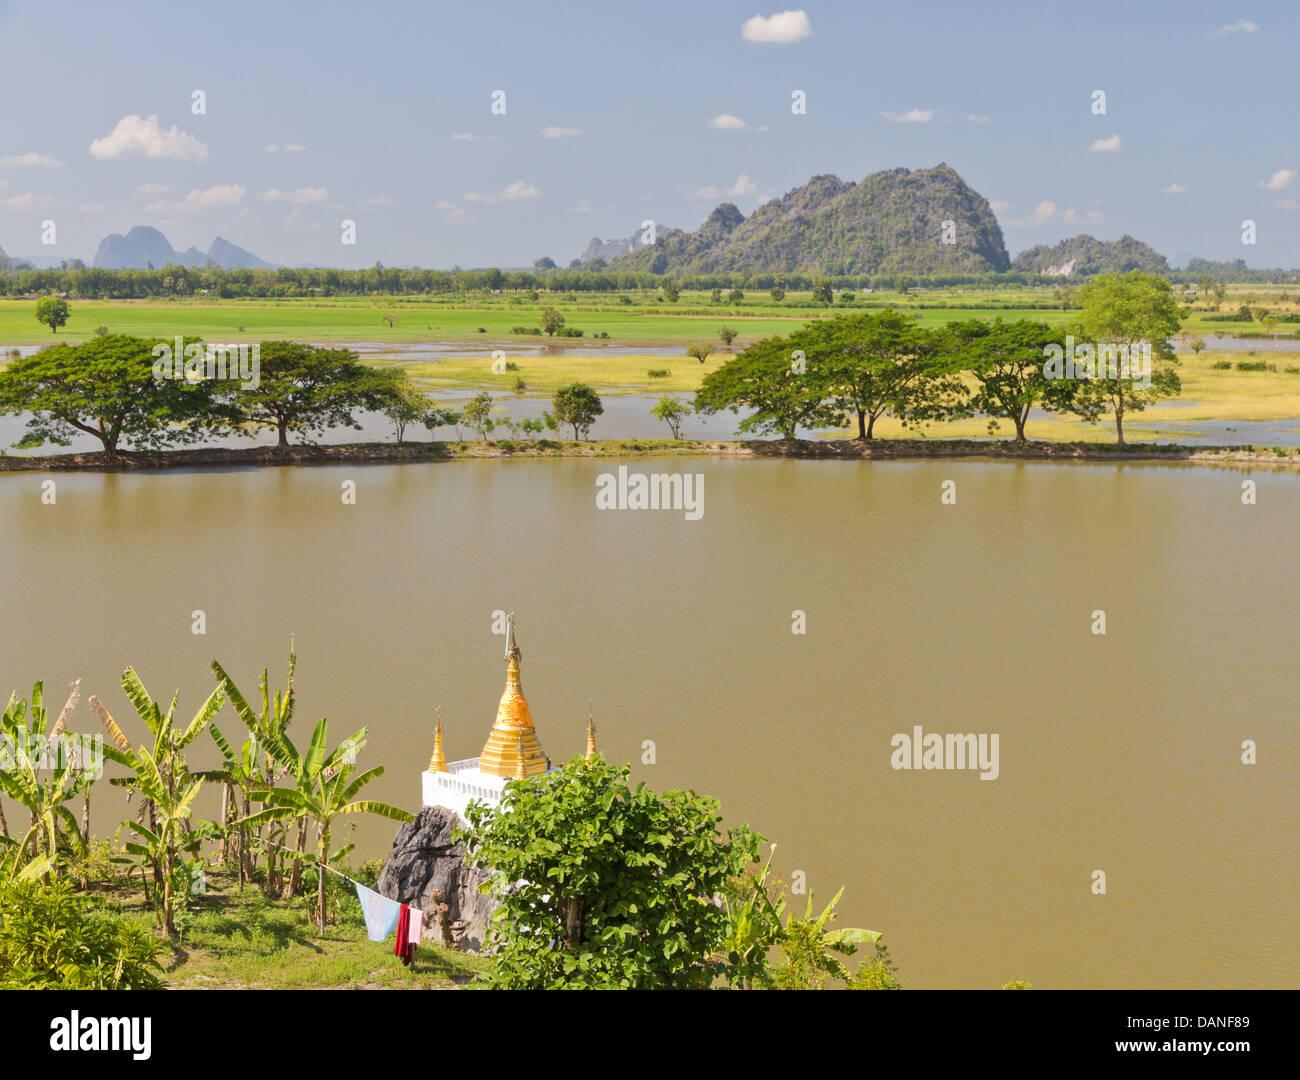 kart over burma burmese countryside with stupa, flooded rice fields, trees and  kart over burma